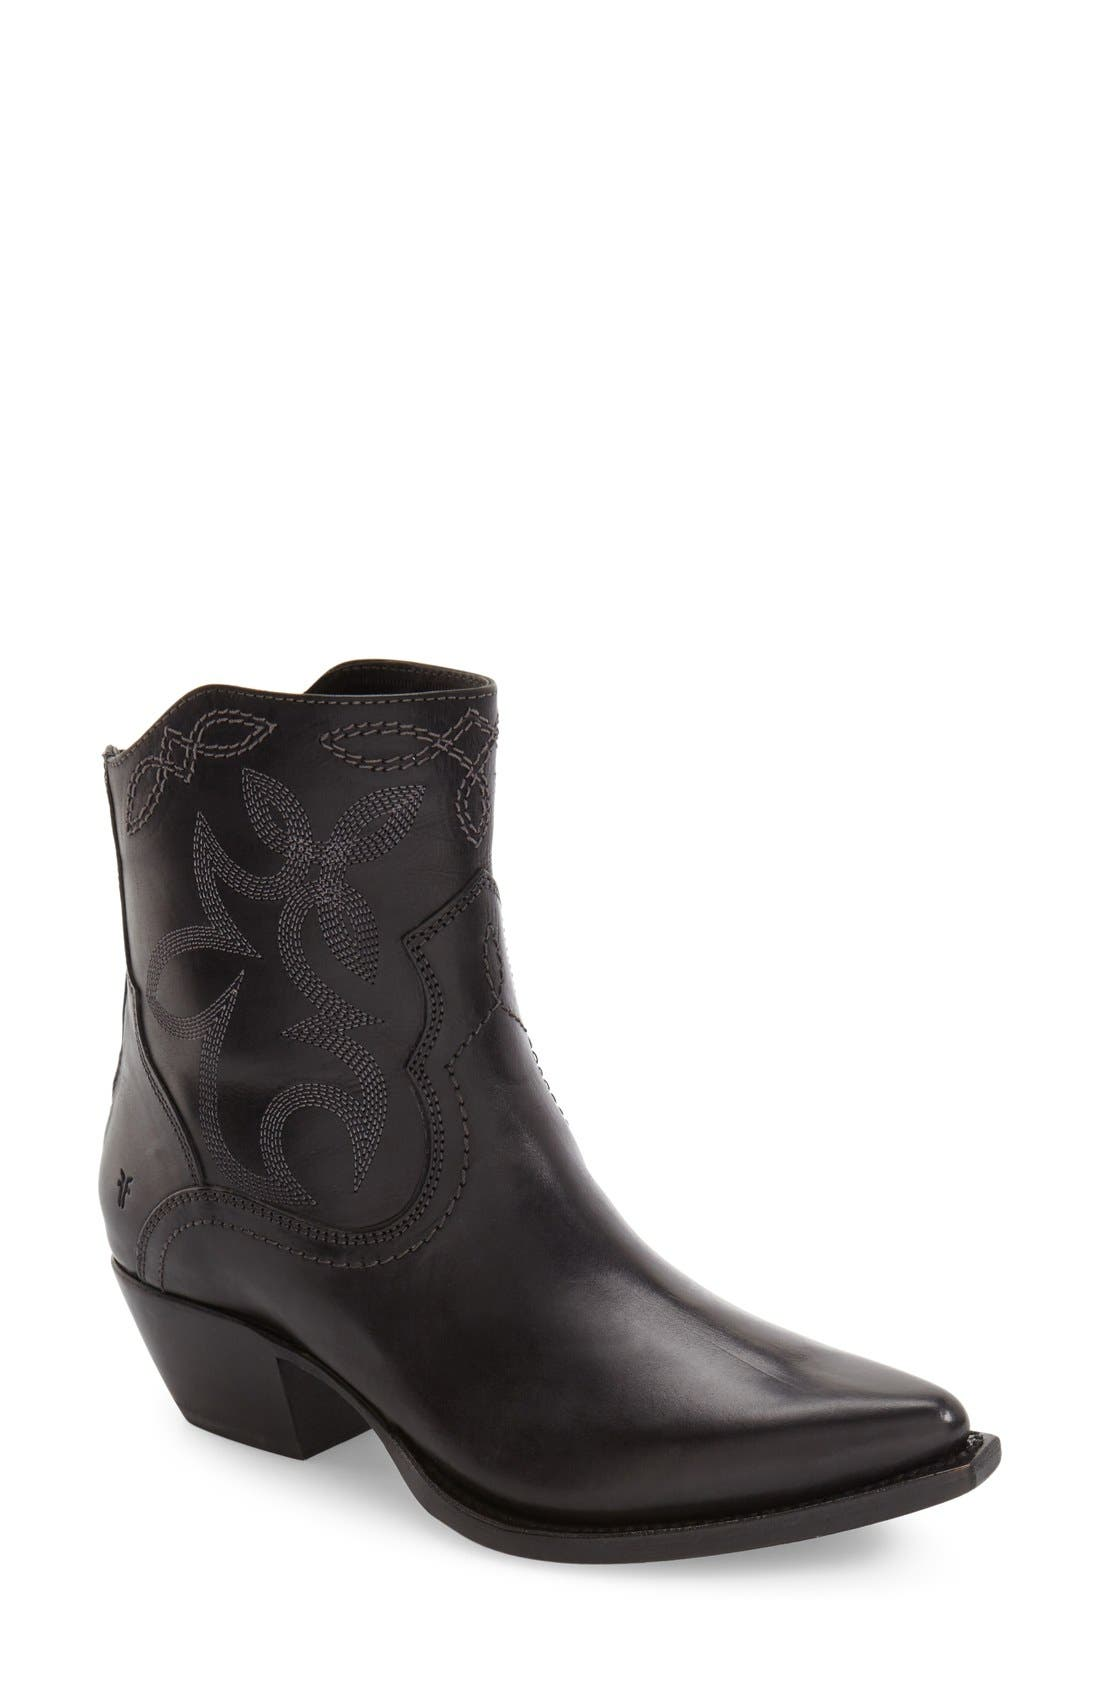 Alternate Image 1 Selected - Frye Shane Western Boot (Women)